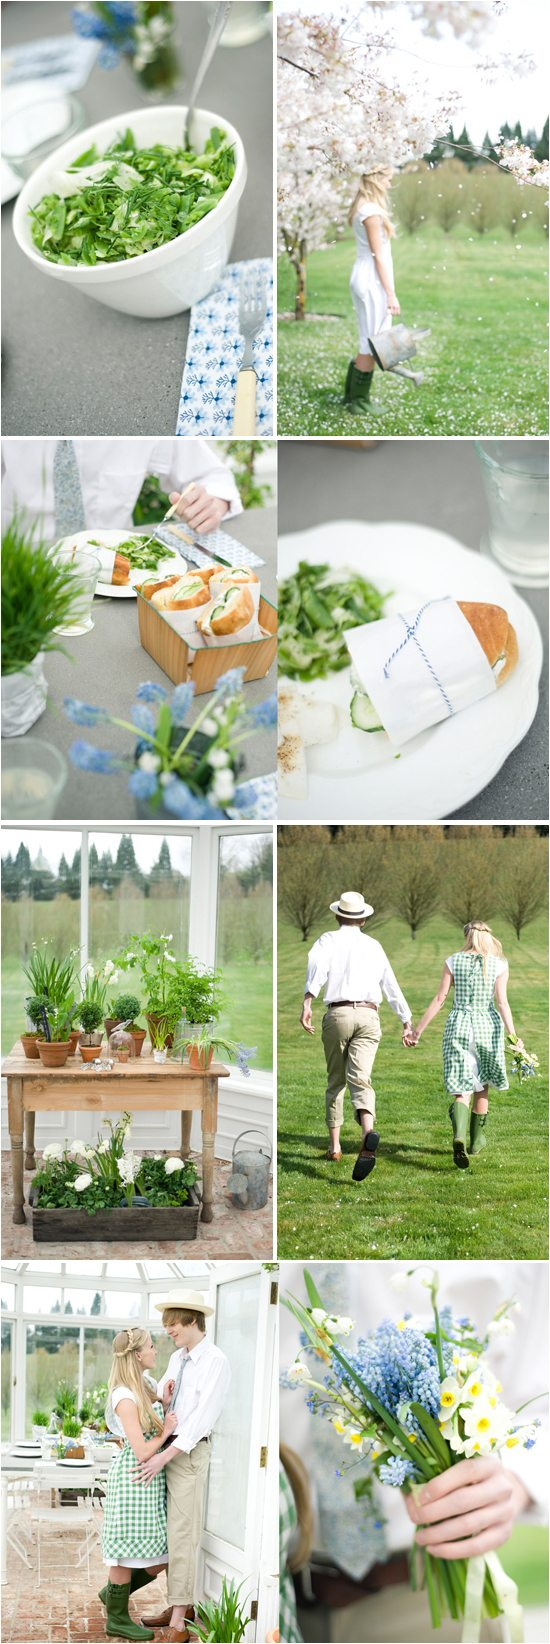 green-white-greenhouse-summer-wedding-picnic-budget-friendly-wedding-ideas